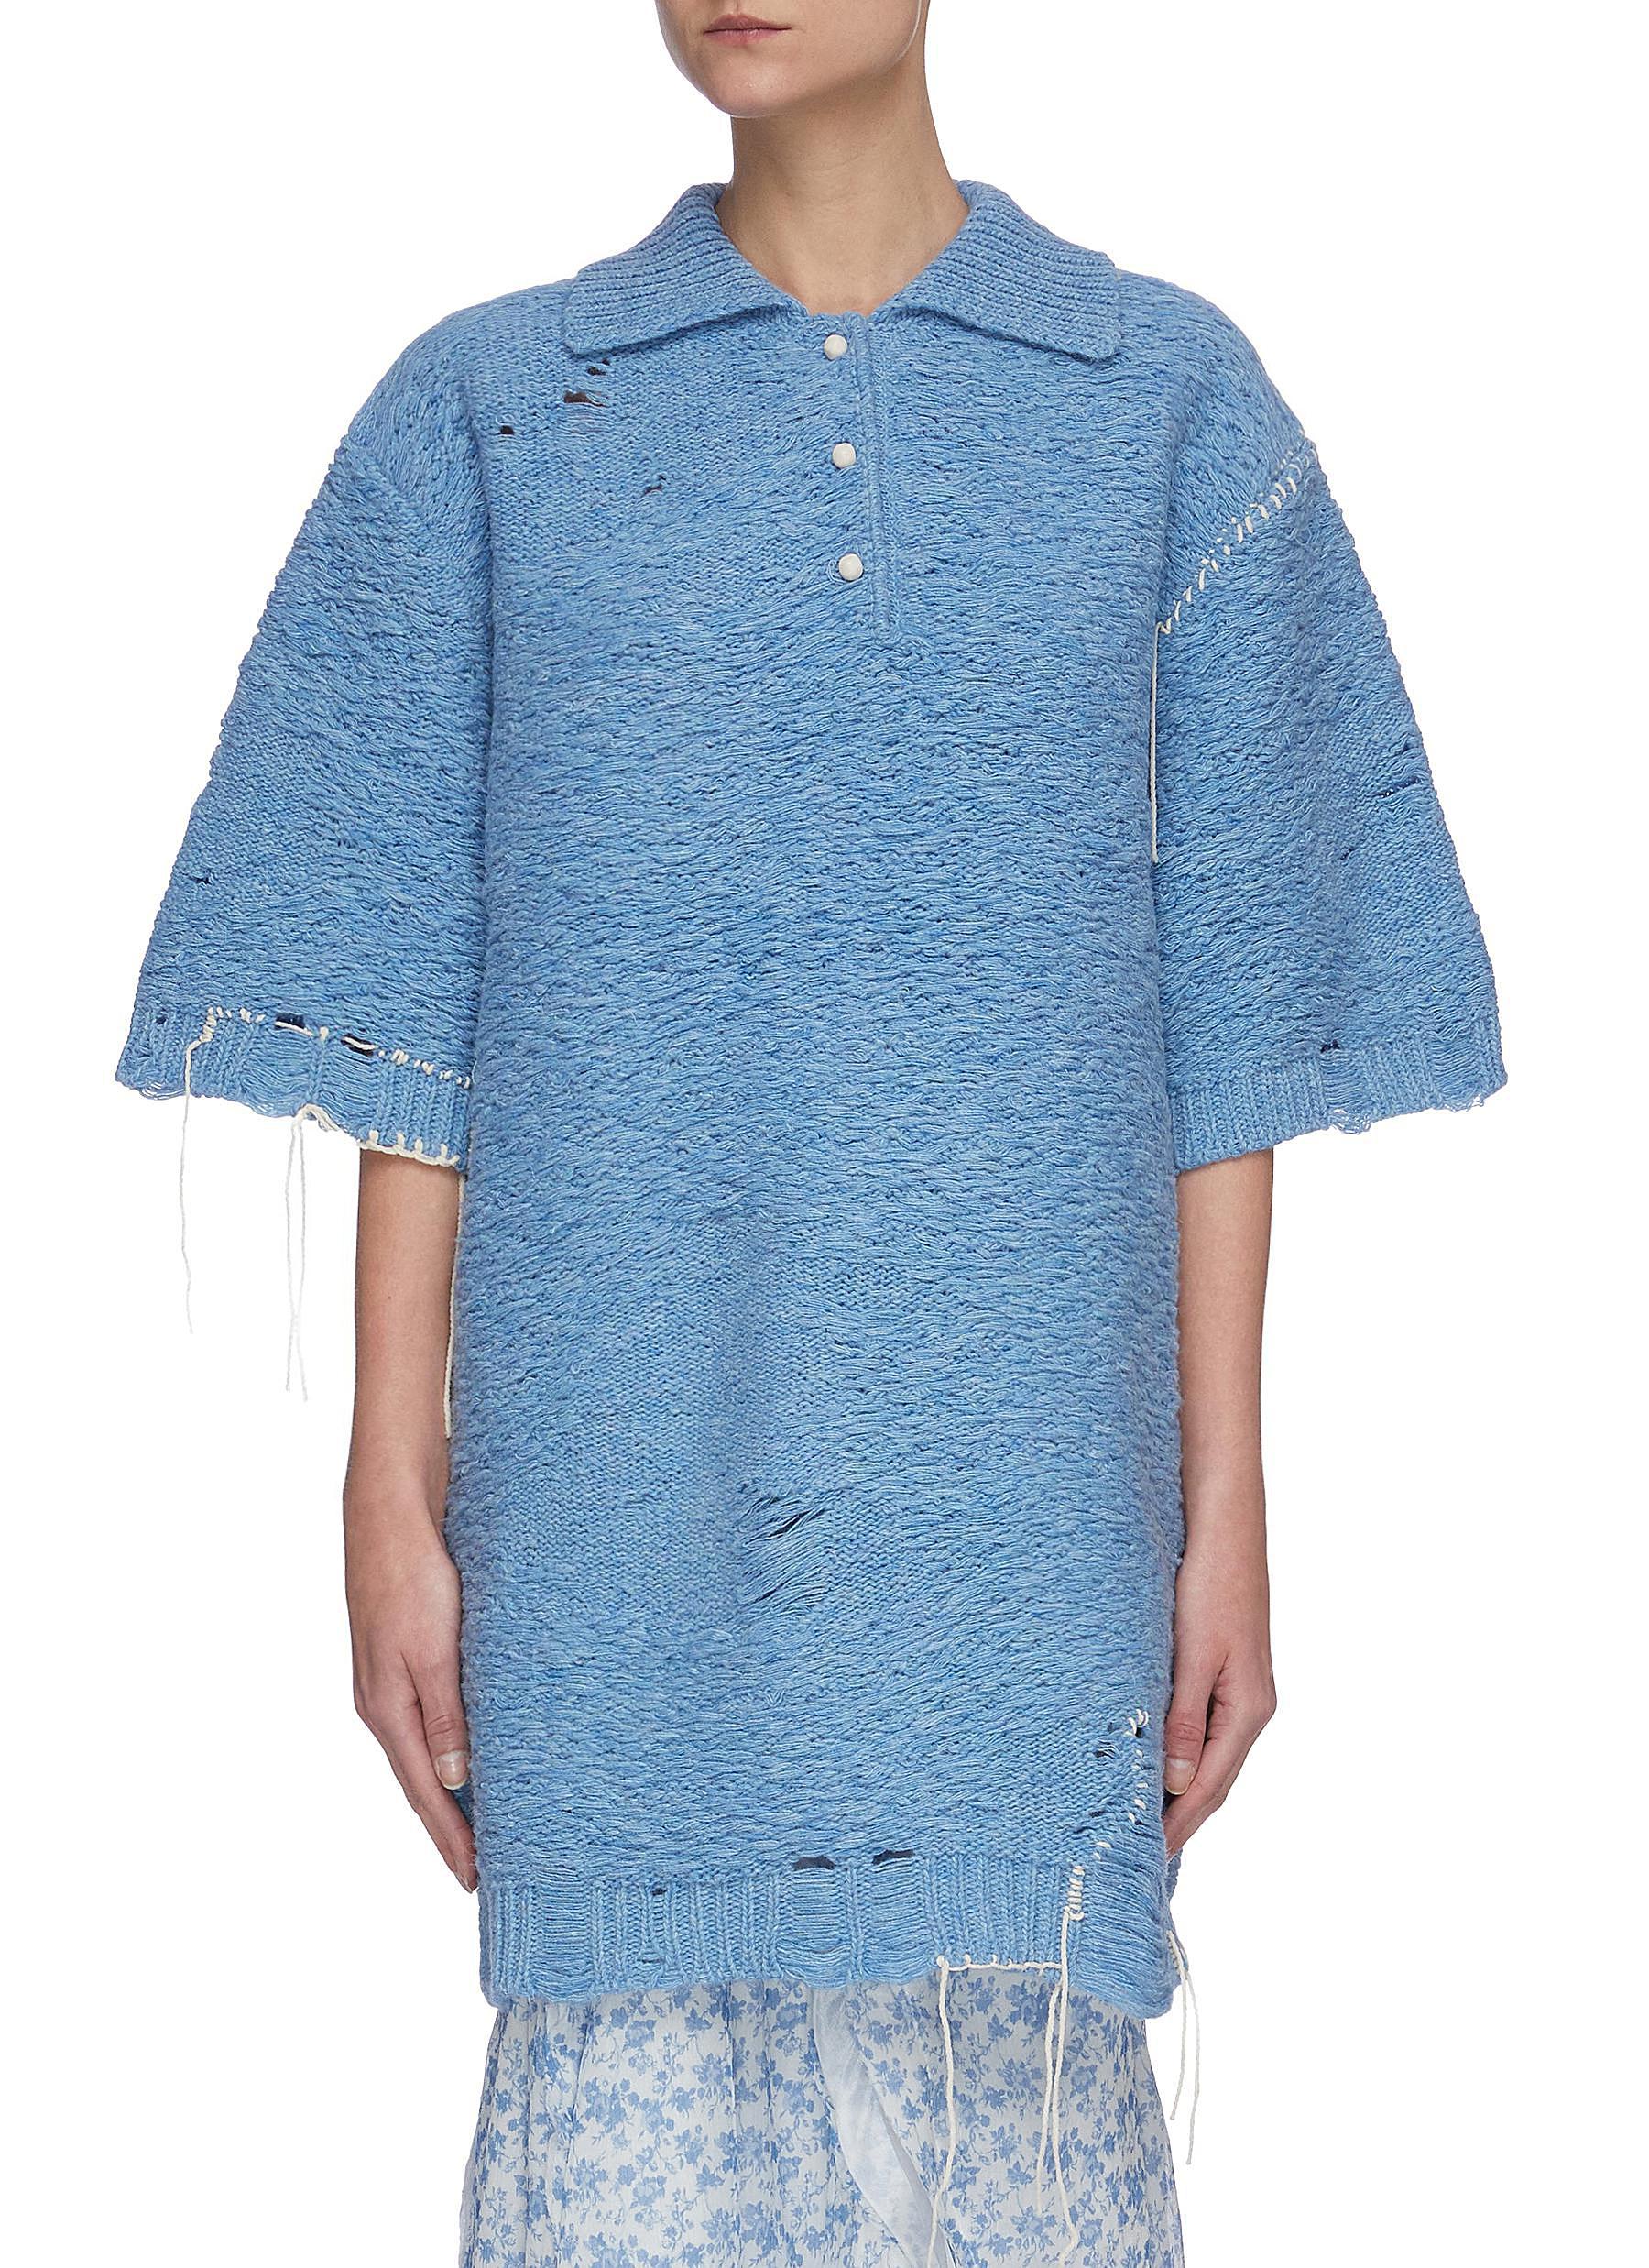 Buy Acne Studios Knitwear Distressed polo neck sweater